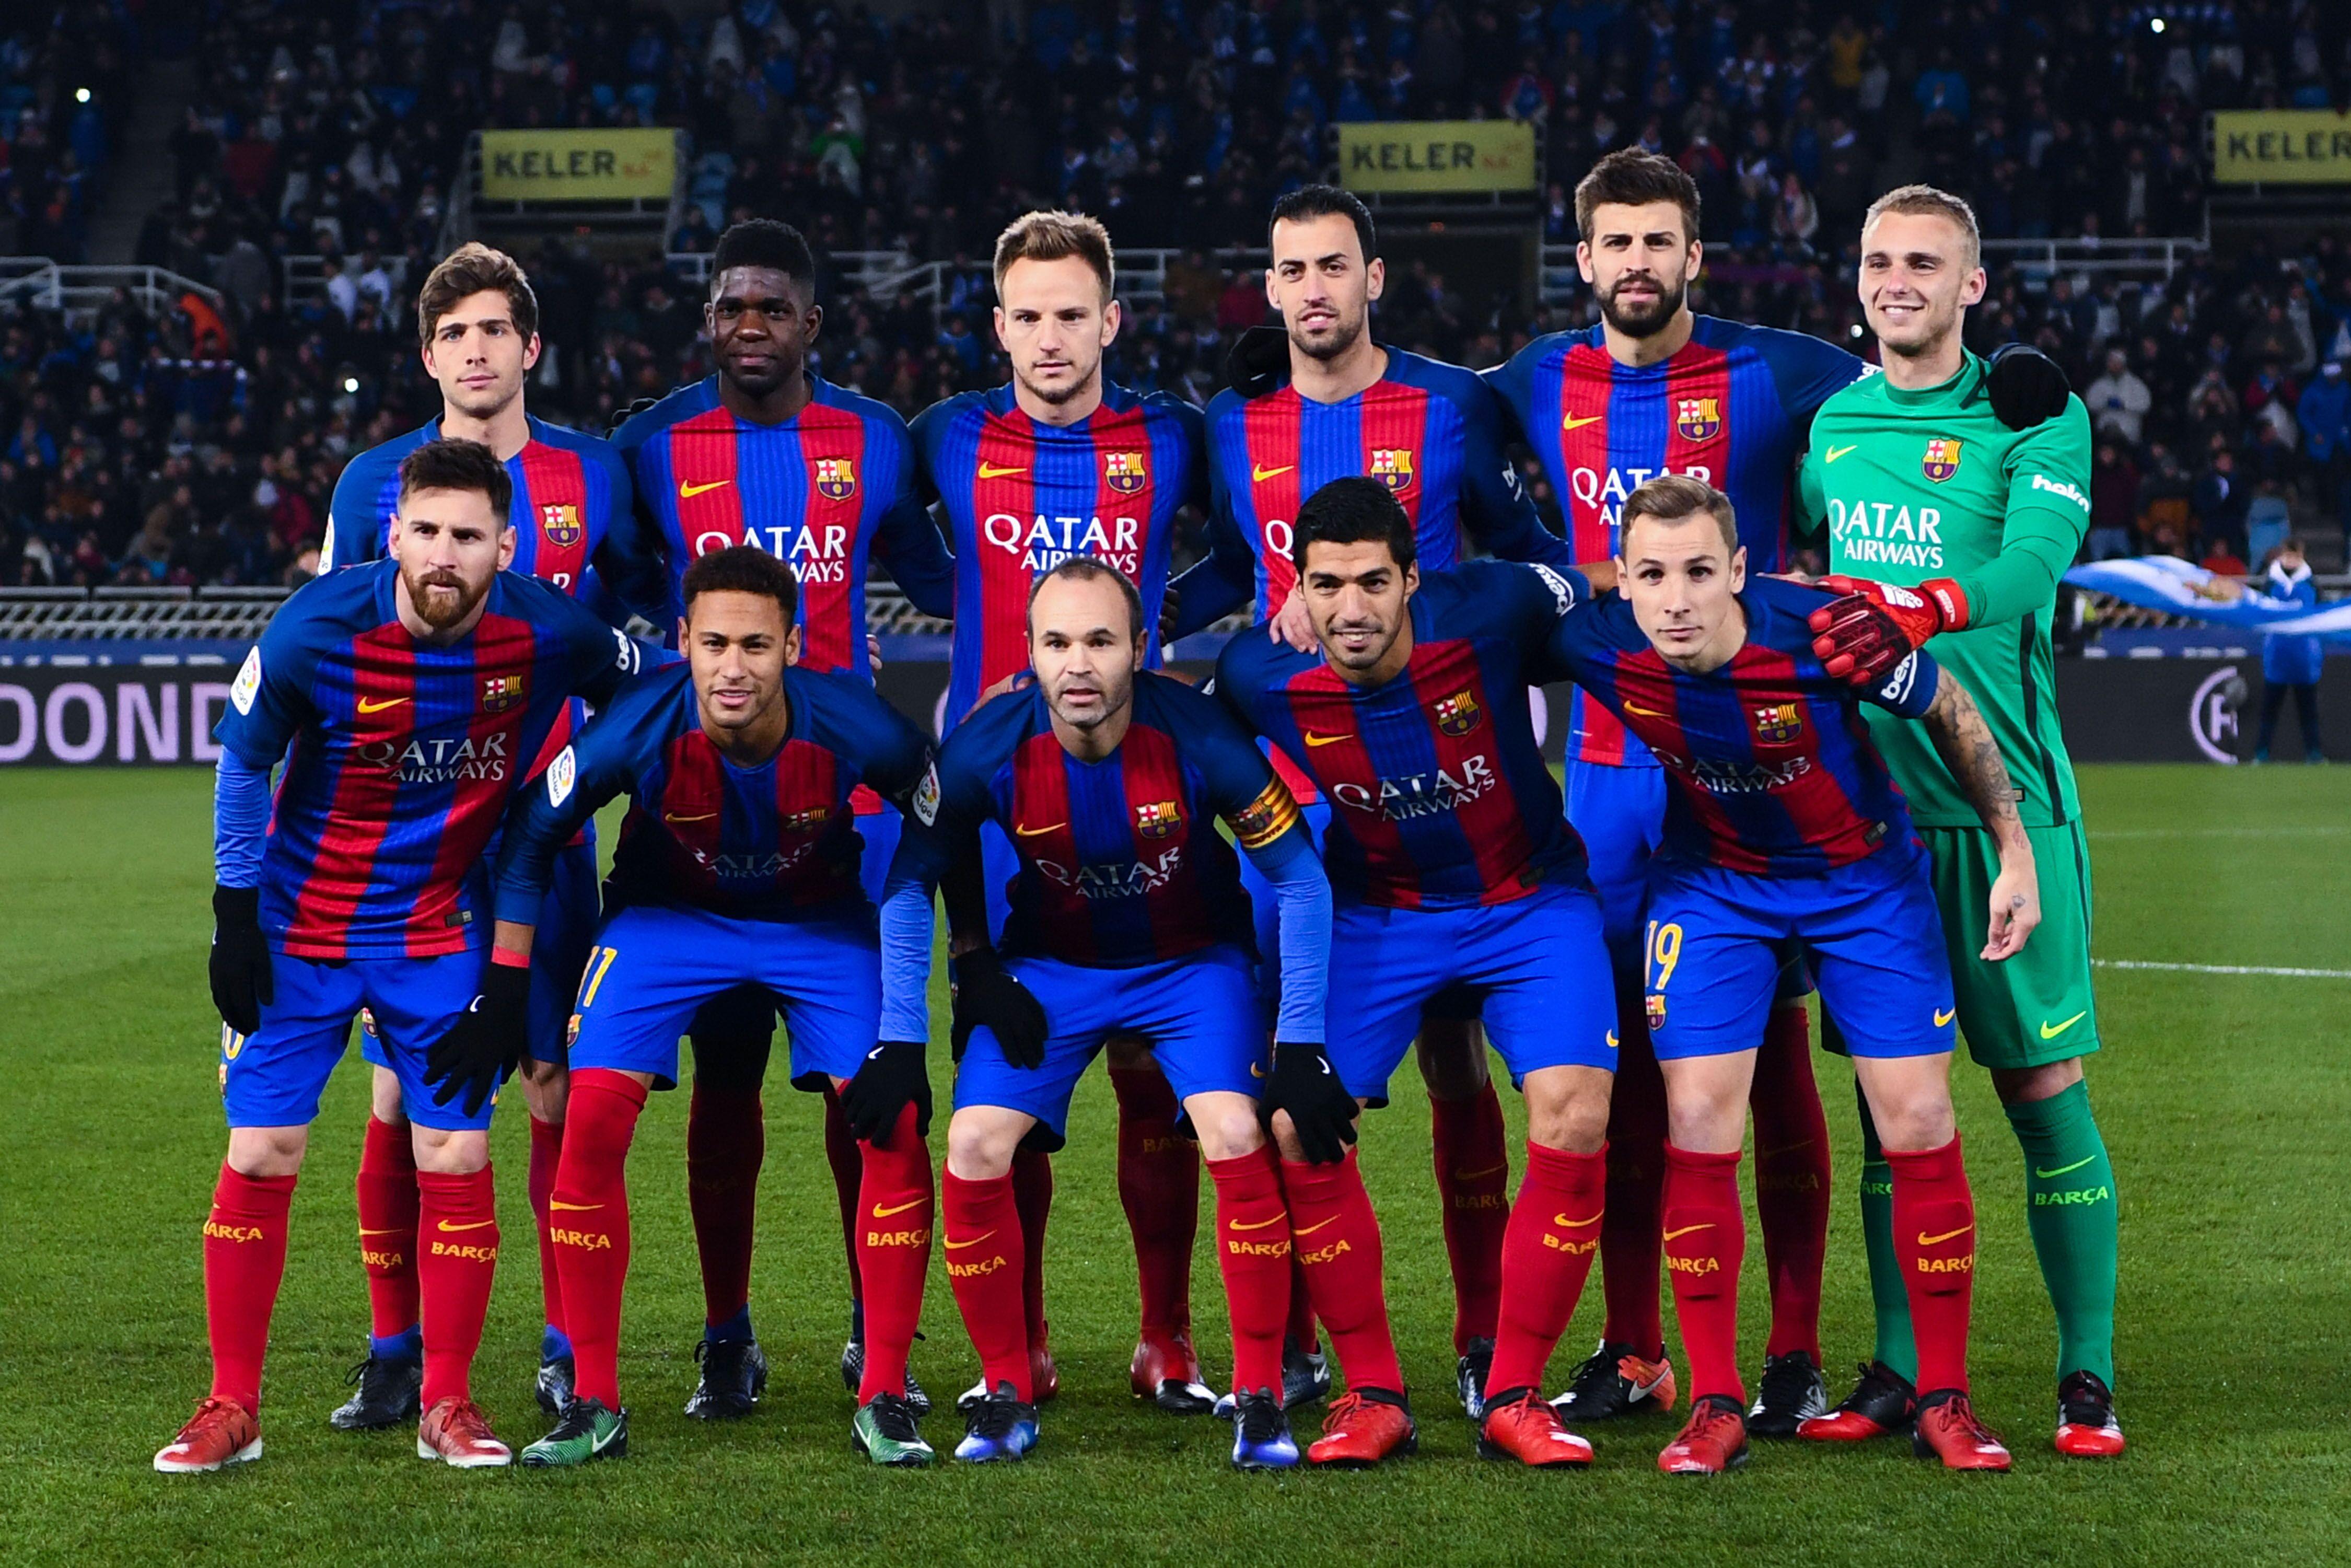 Fc Barcelona Host Real Sociedad In The Copa Del Rey Quarter Final